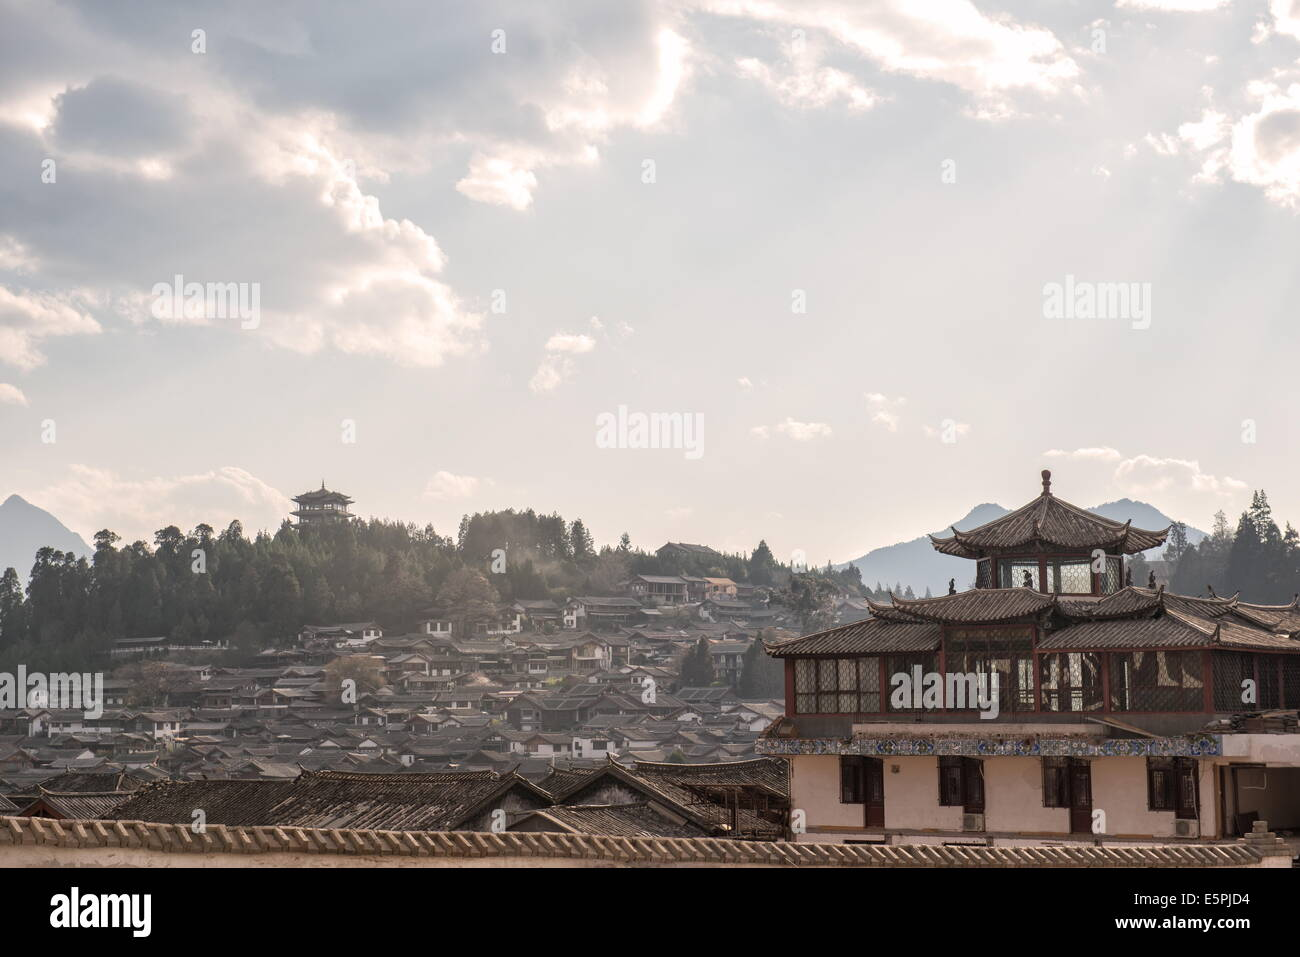 Lijiang architecture with Lion Hill and Wan Gu Tower, Lijiang, Yunnan, China, Asia - Stock Image